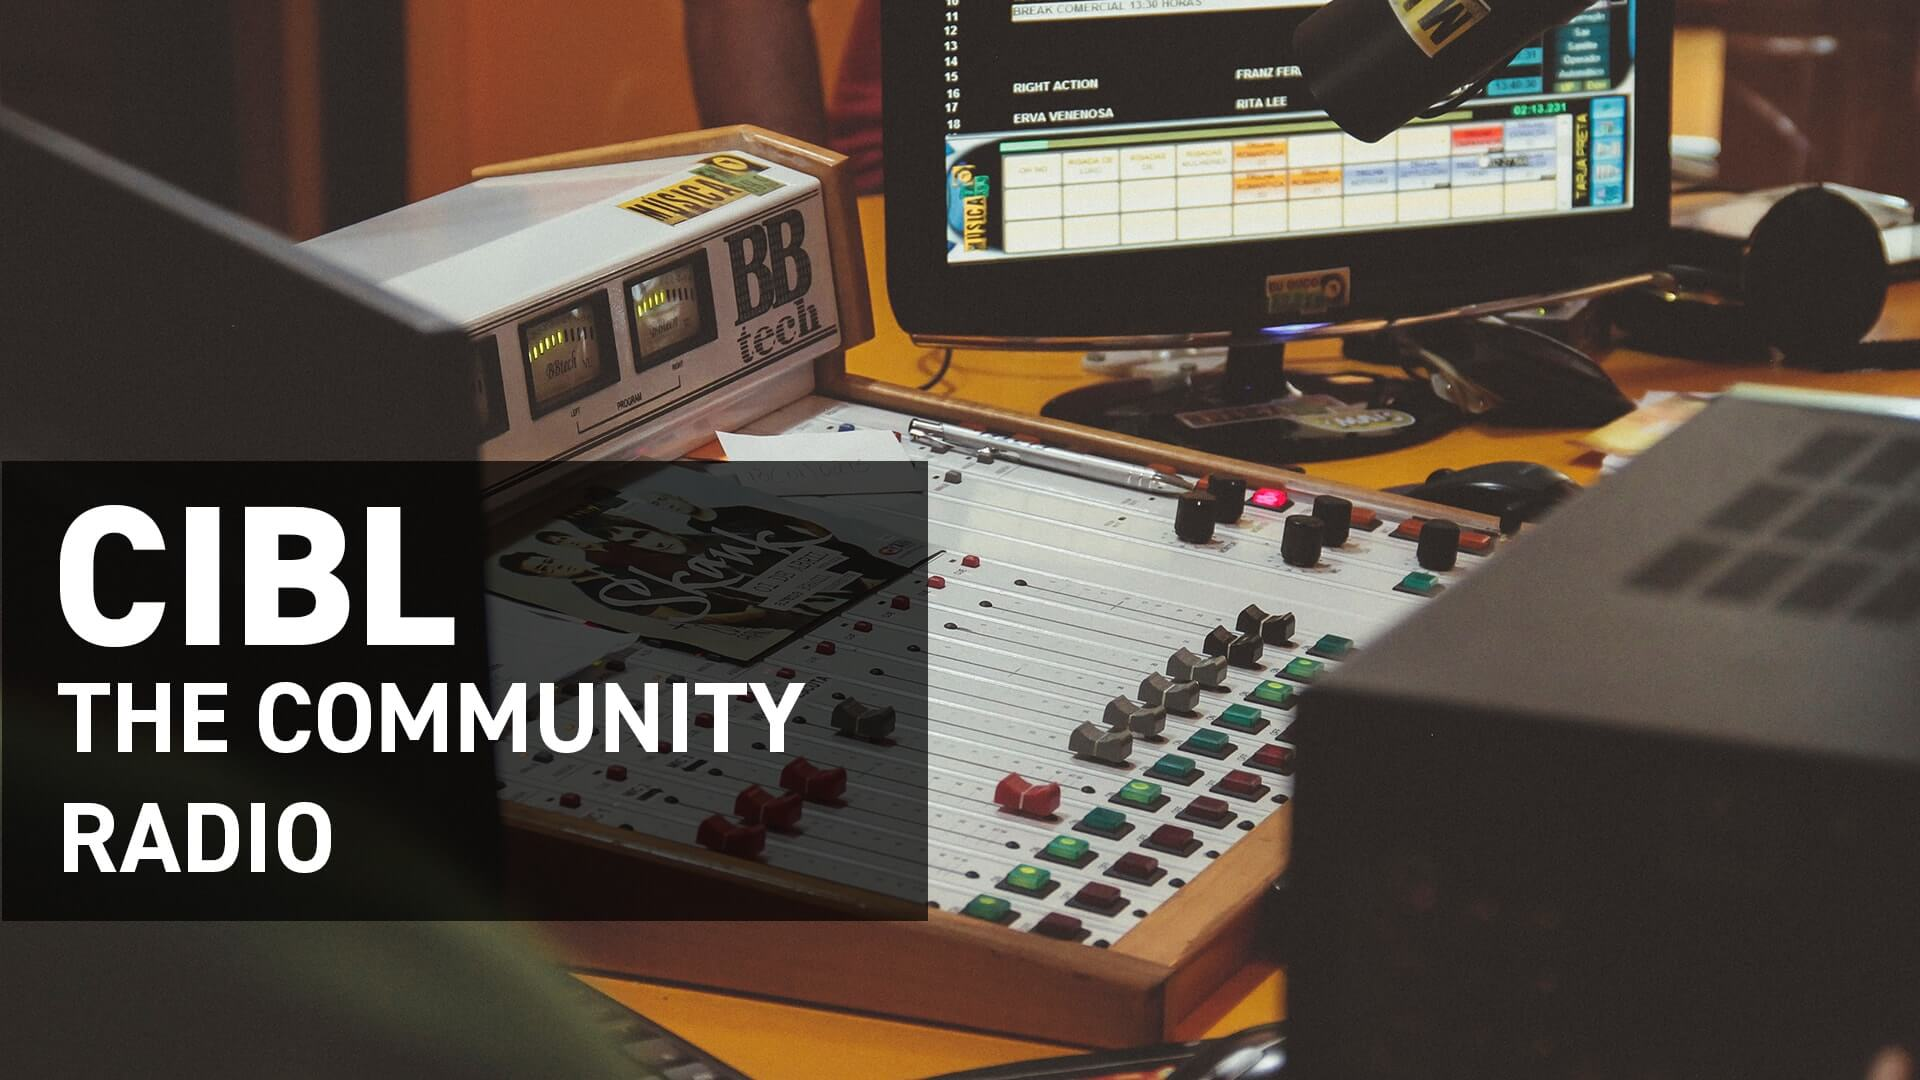 Community radio: CIBL